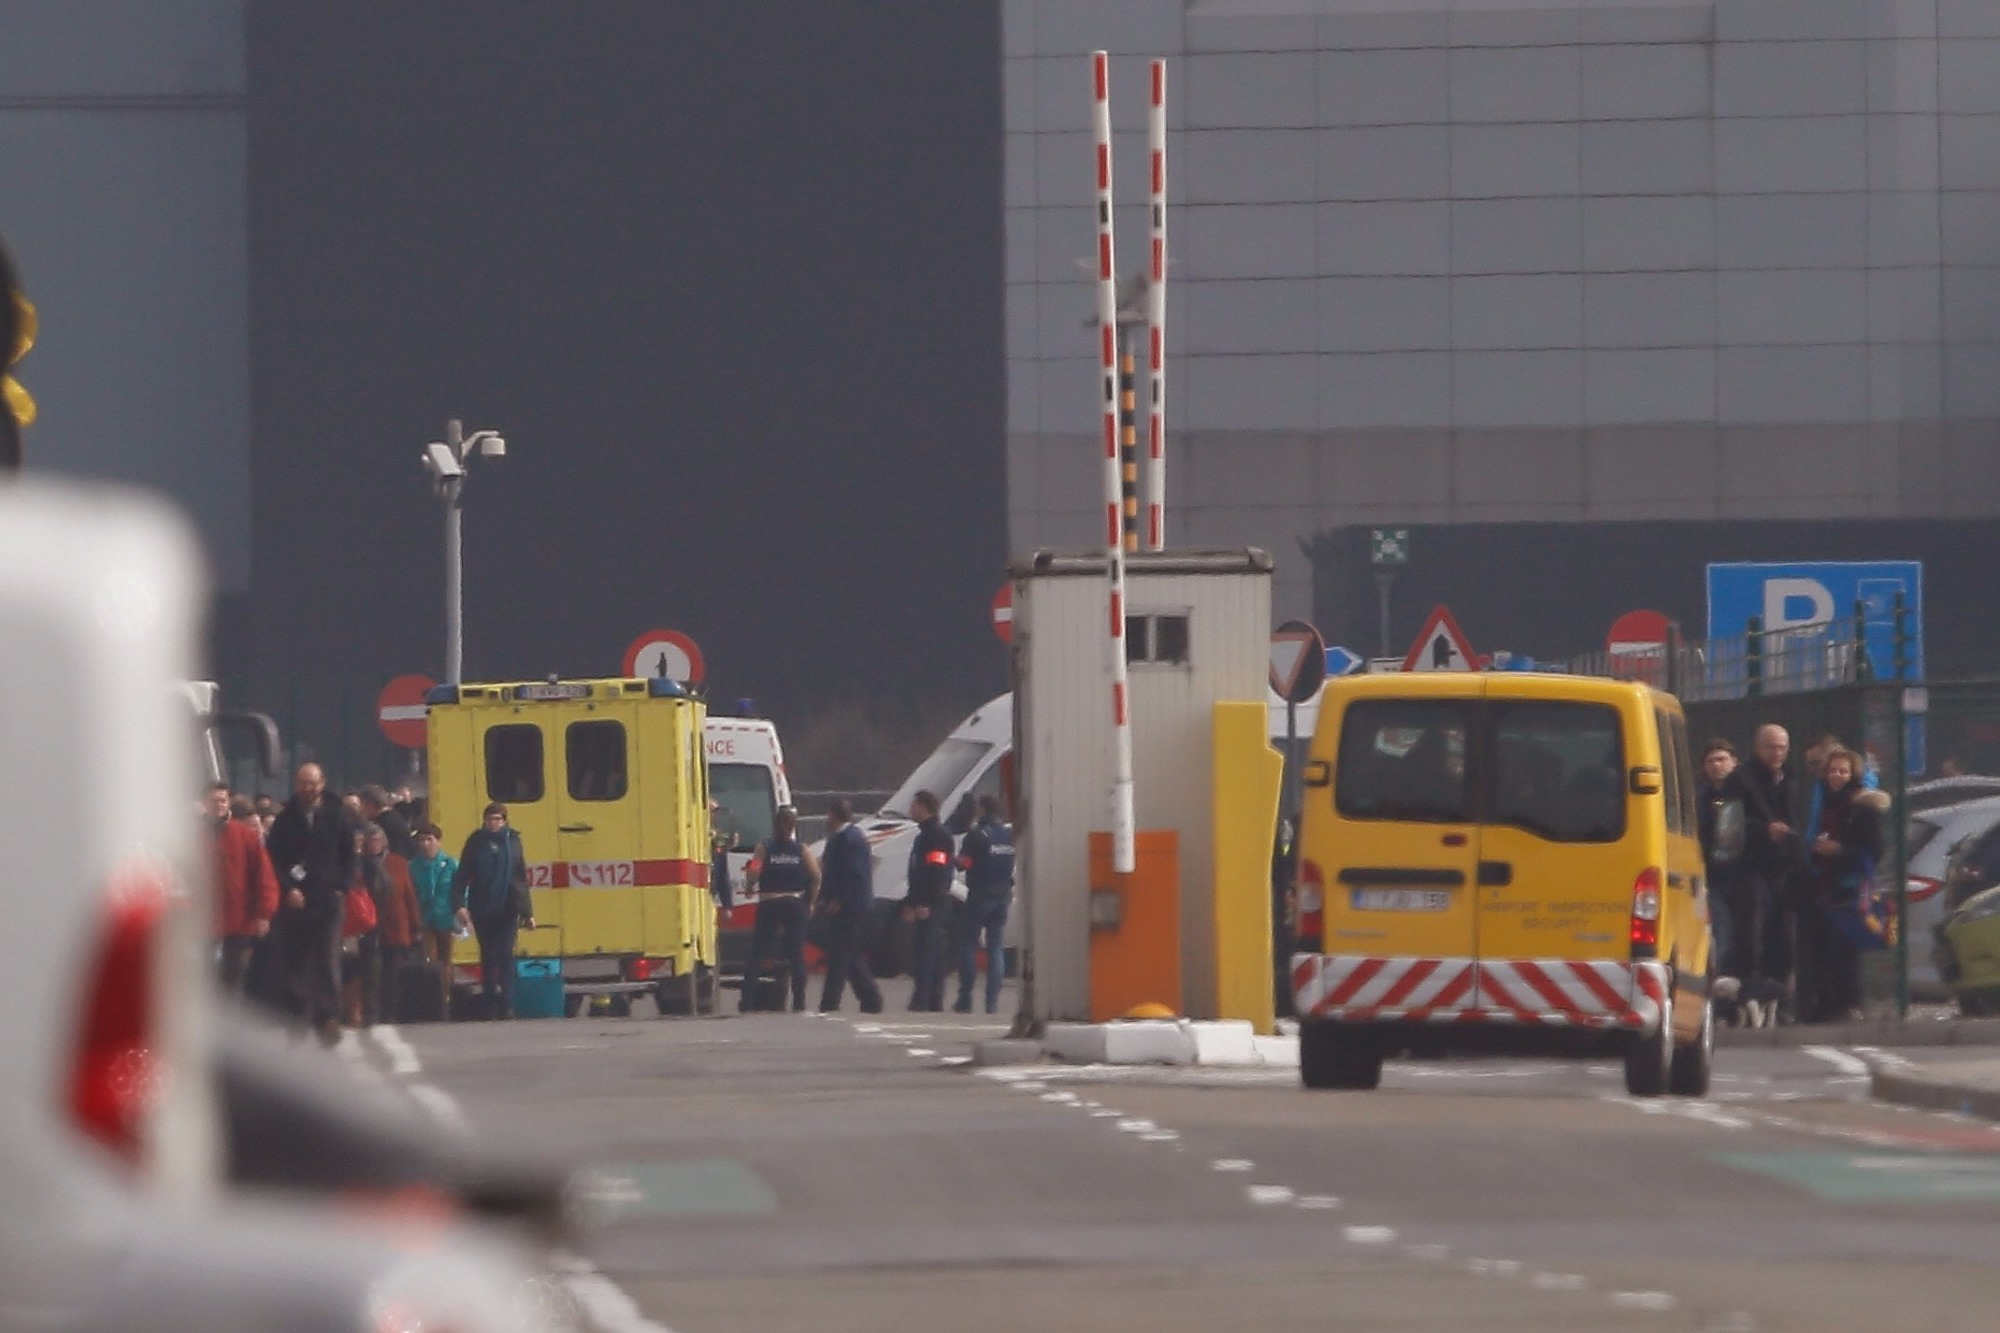 أحد انتحاريي مطار بروكسل عمل فيه 5 سنوات